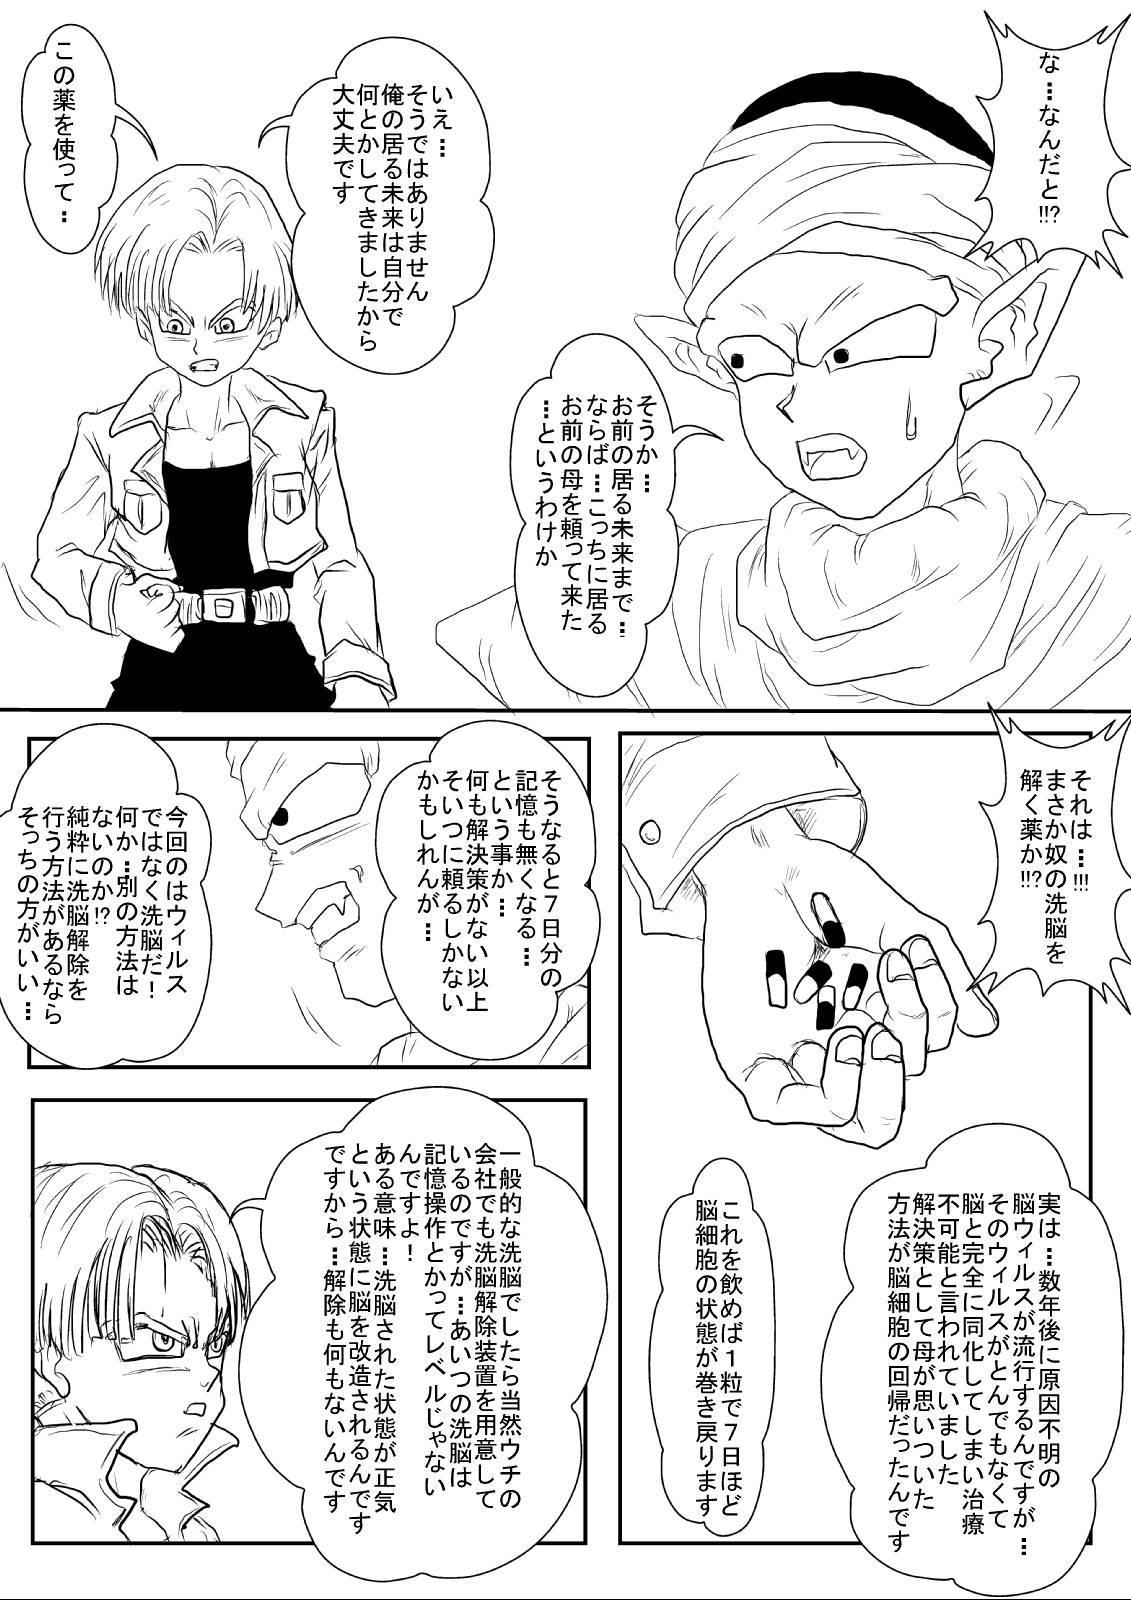 [Alice.Blood] Sennou Kyouiku-shitsu~ Jinzou ☆-kan 18-gou-hen (Dragon Ball Z) 10